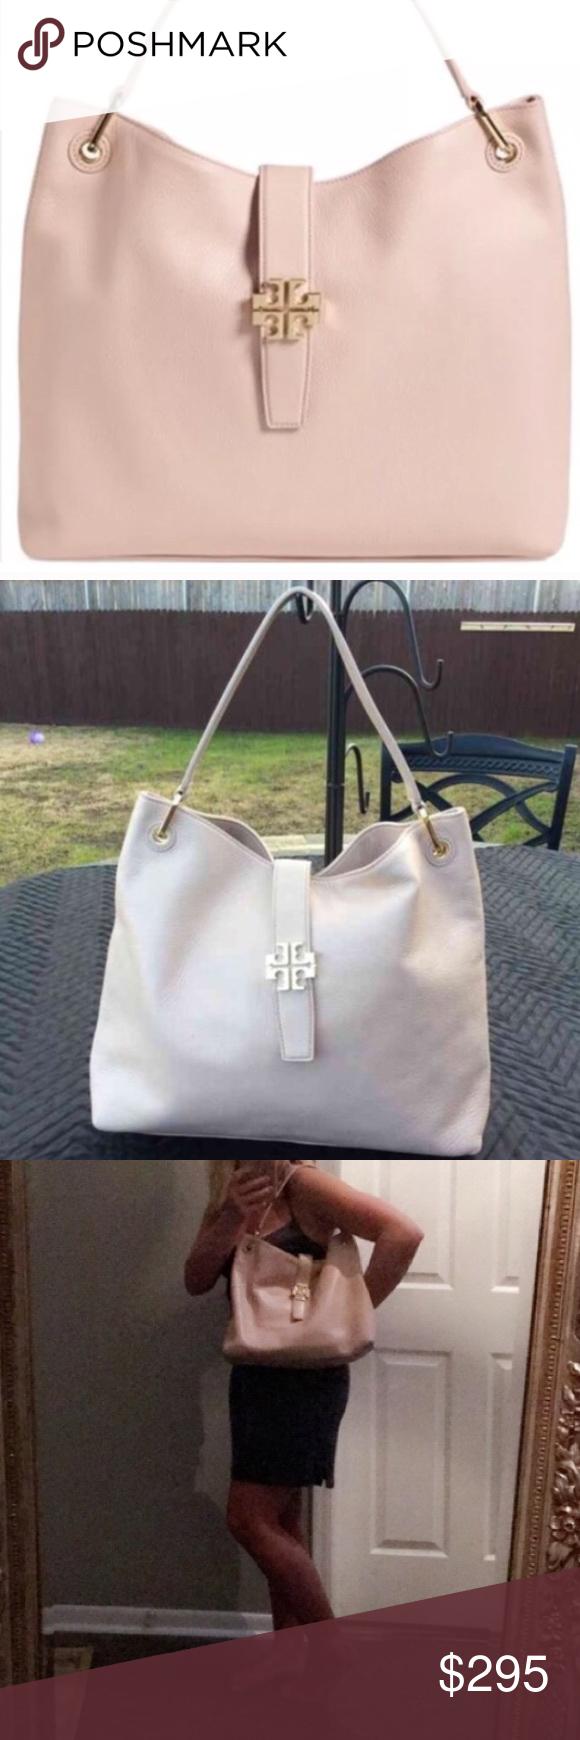 27b57aa73a6 Spotted while shopping on Poshmark  Tory Burch Blush Plaque Hobo!  poshmark   fashion  shopping  style  Tory Burch  Handbags